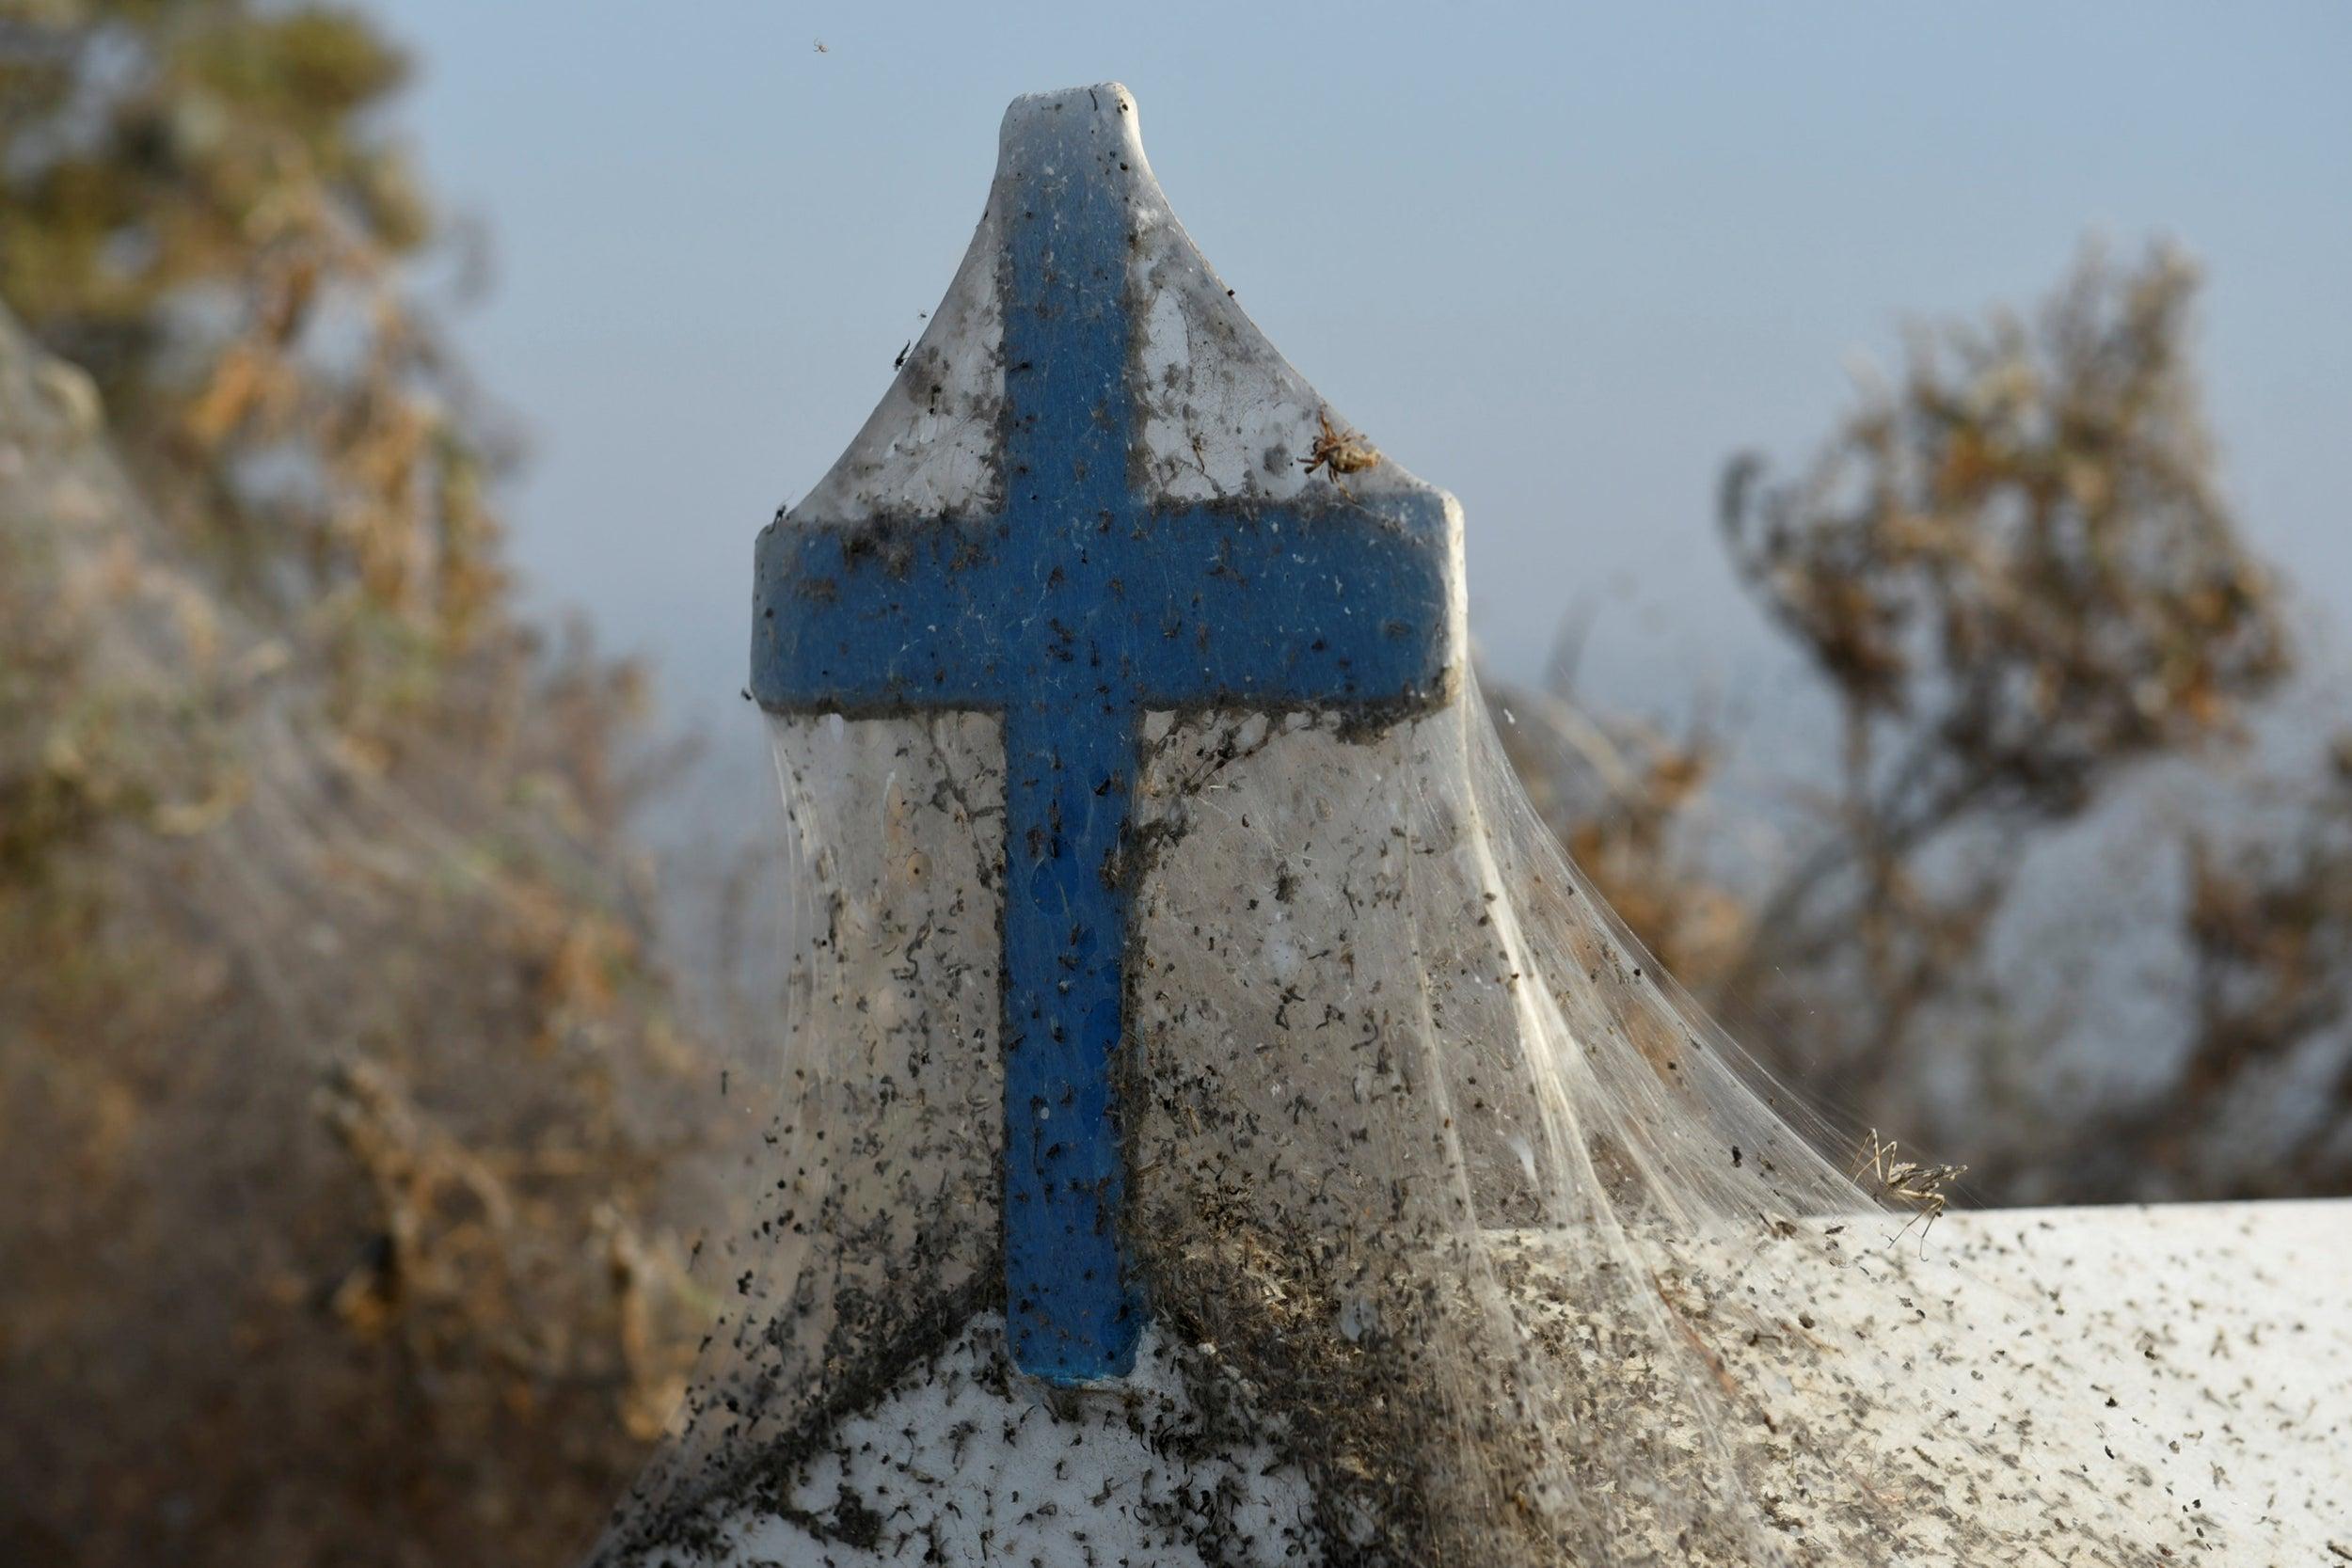 Giant 1,000m spider web covers Greek lake | The IndependentShapeleftrightShapeShape